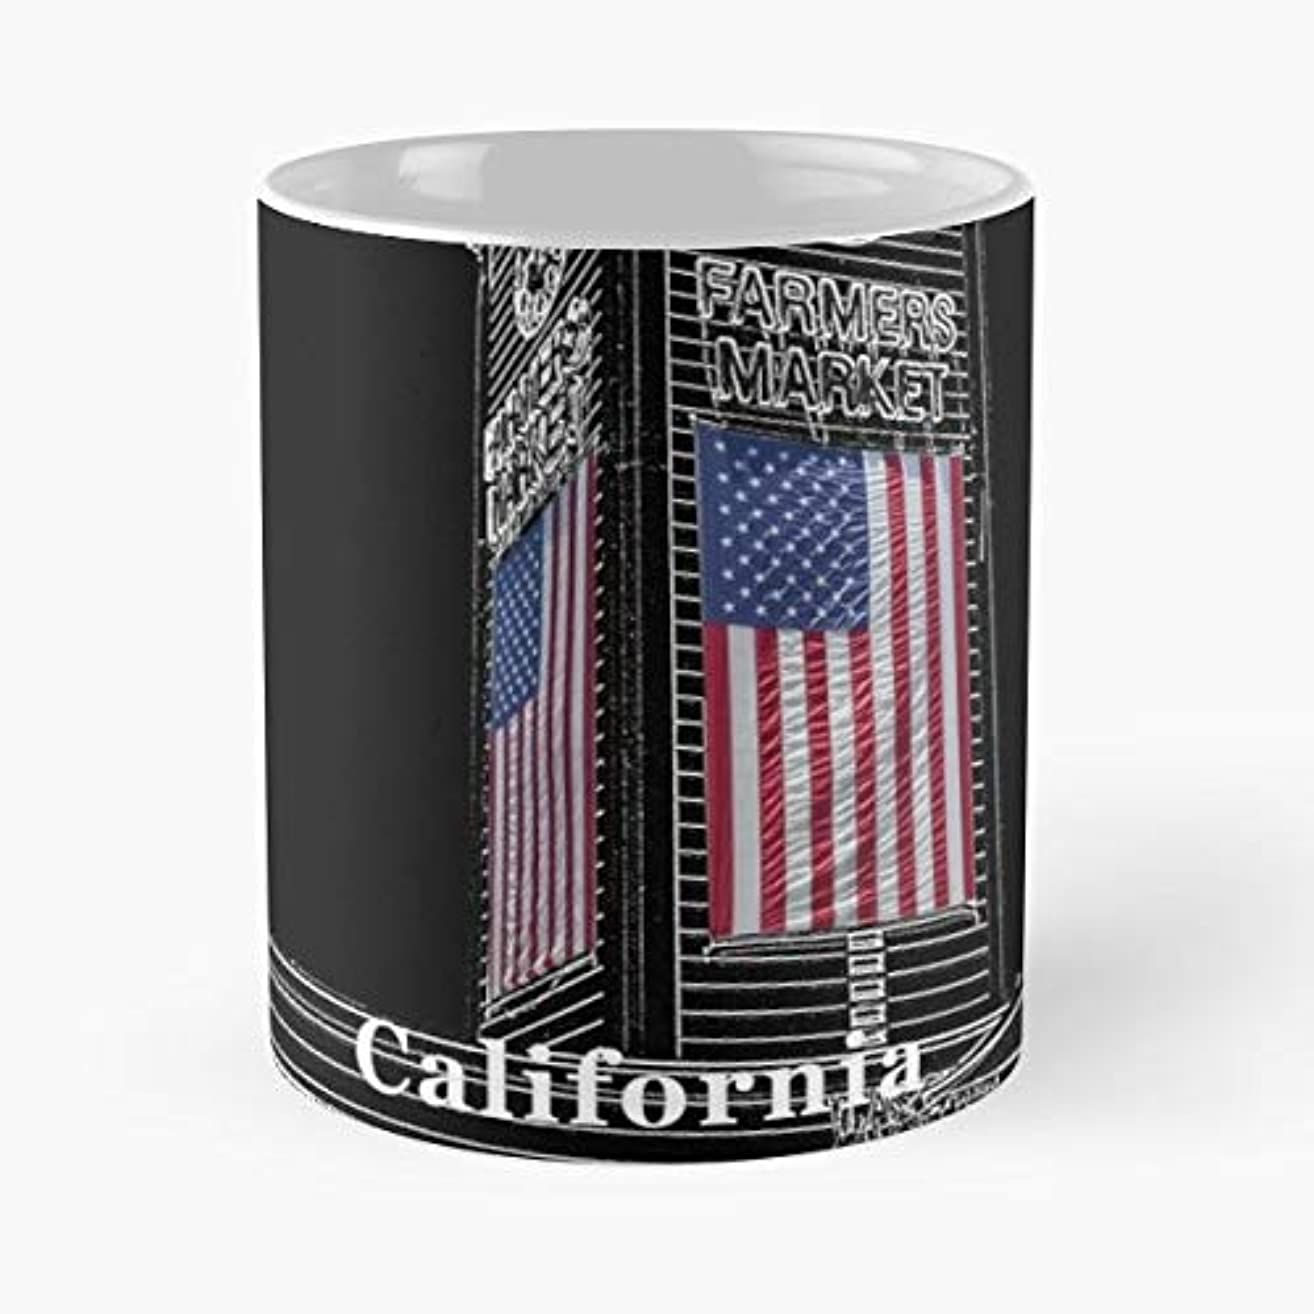 Downtown La Skyline Los Angeles - Coffee Mugs Unique Ceramic Novelty Cup